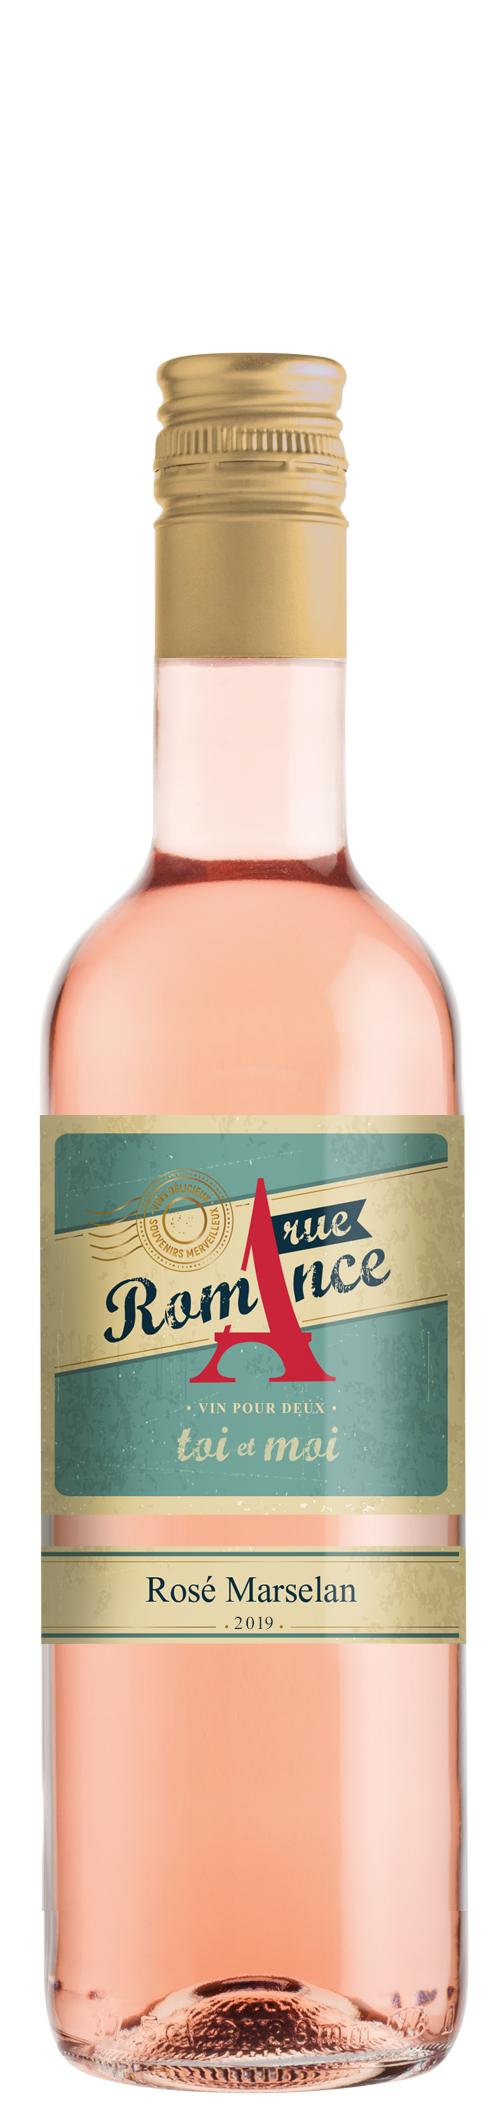 Вино Рю Романс Розе от Марселан, 0.375 л, Домейн Бойар